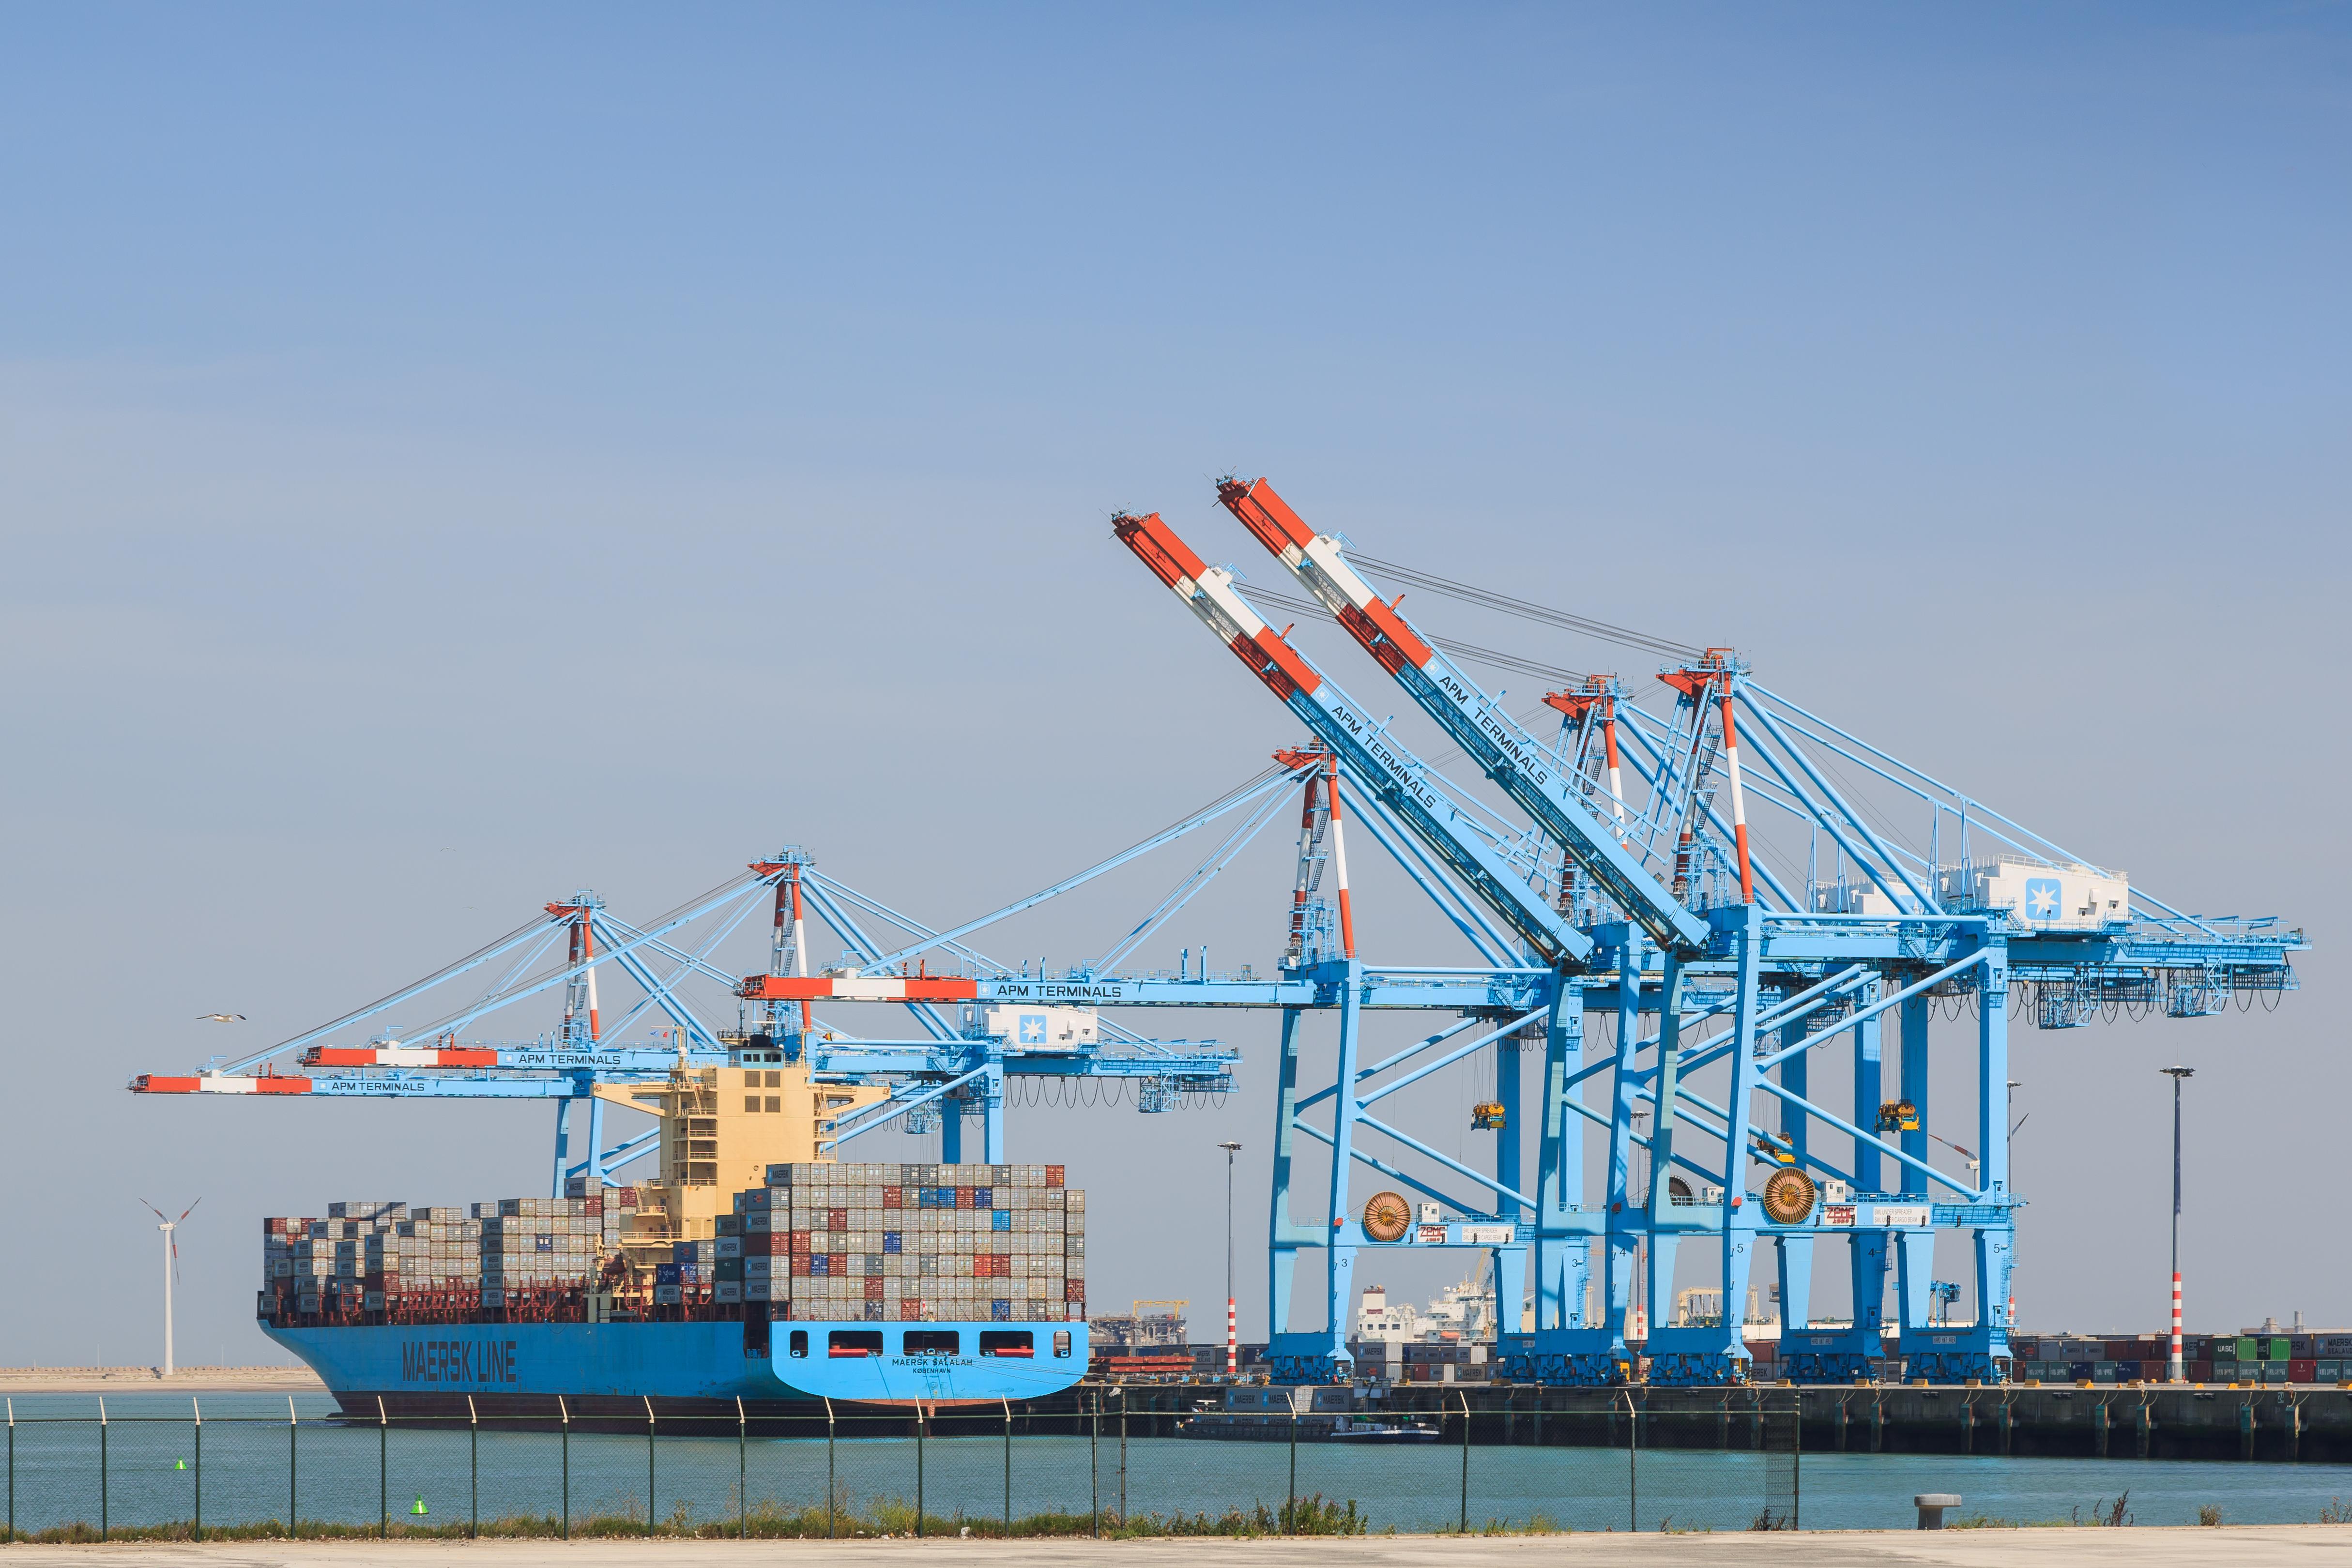 File:Zeebrugge Belgium Portal-crane-APM-Terminals-02 jpg